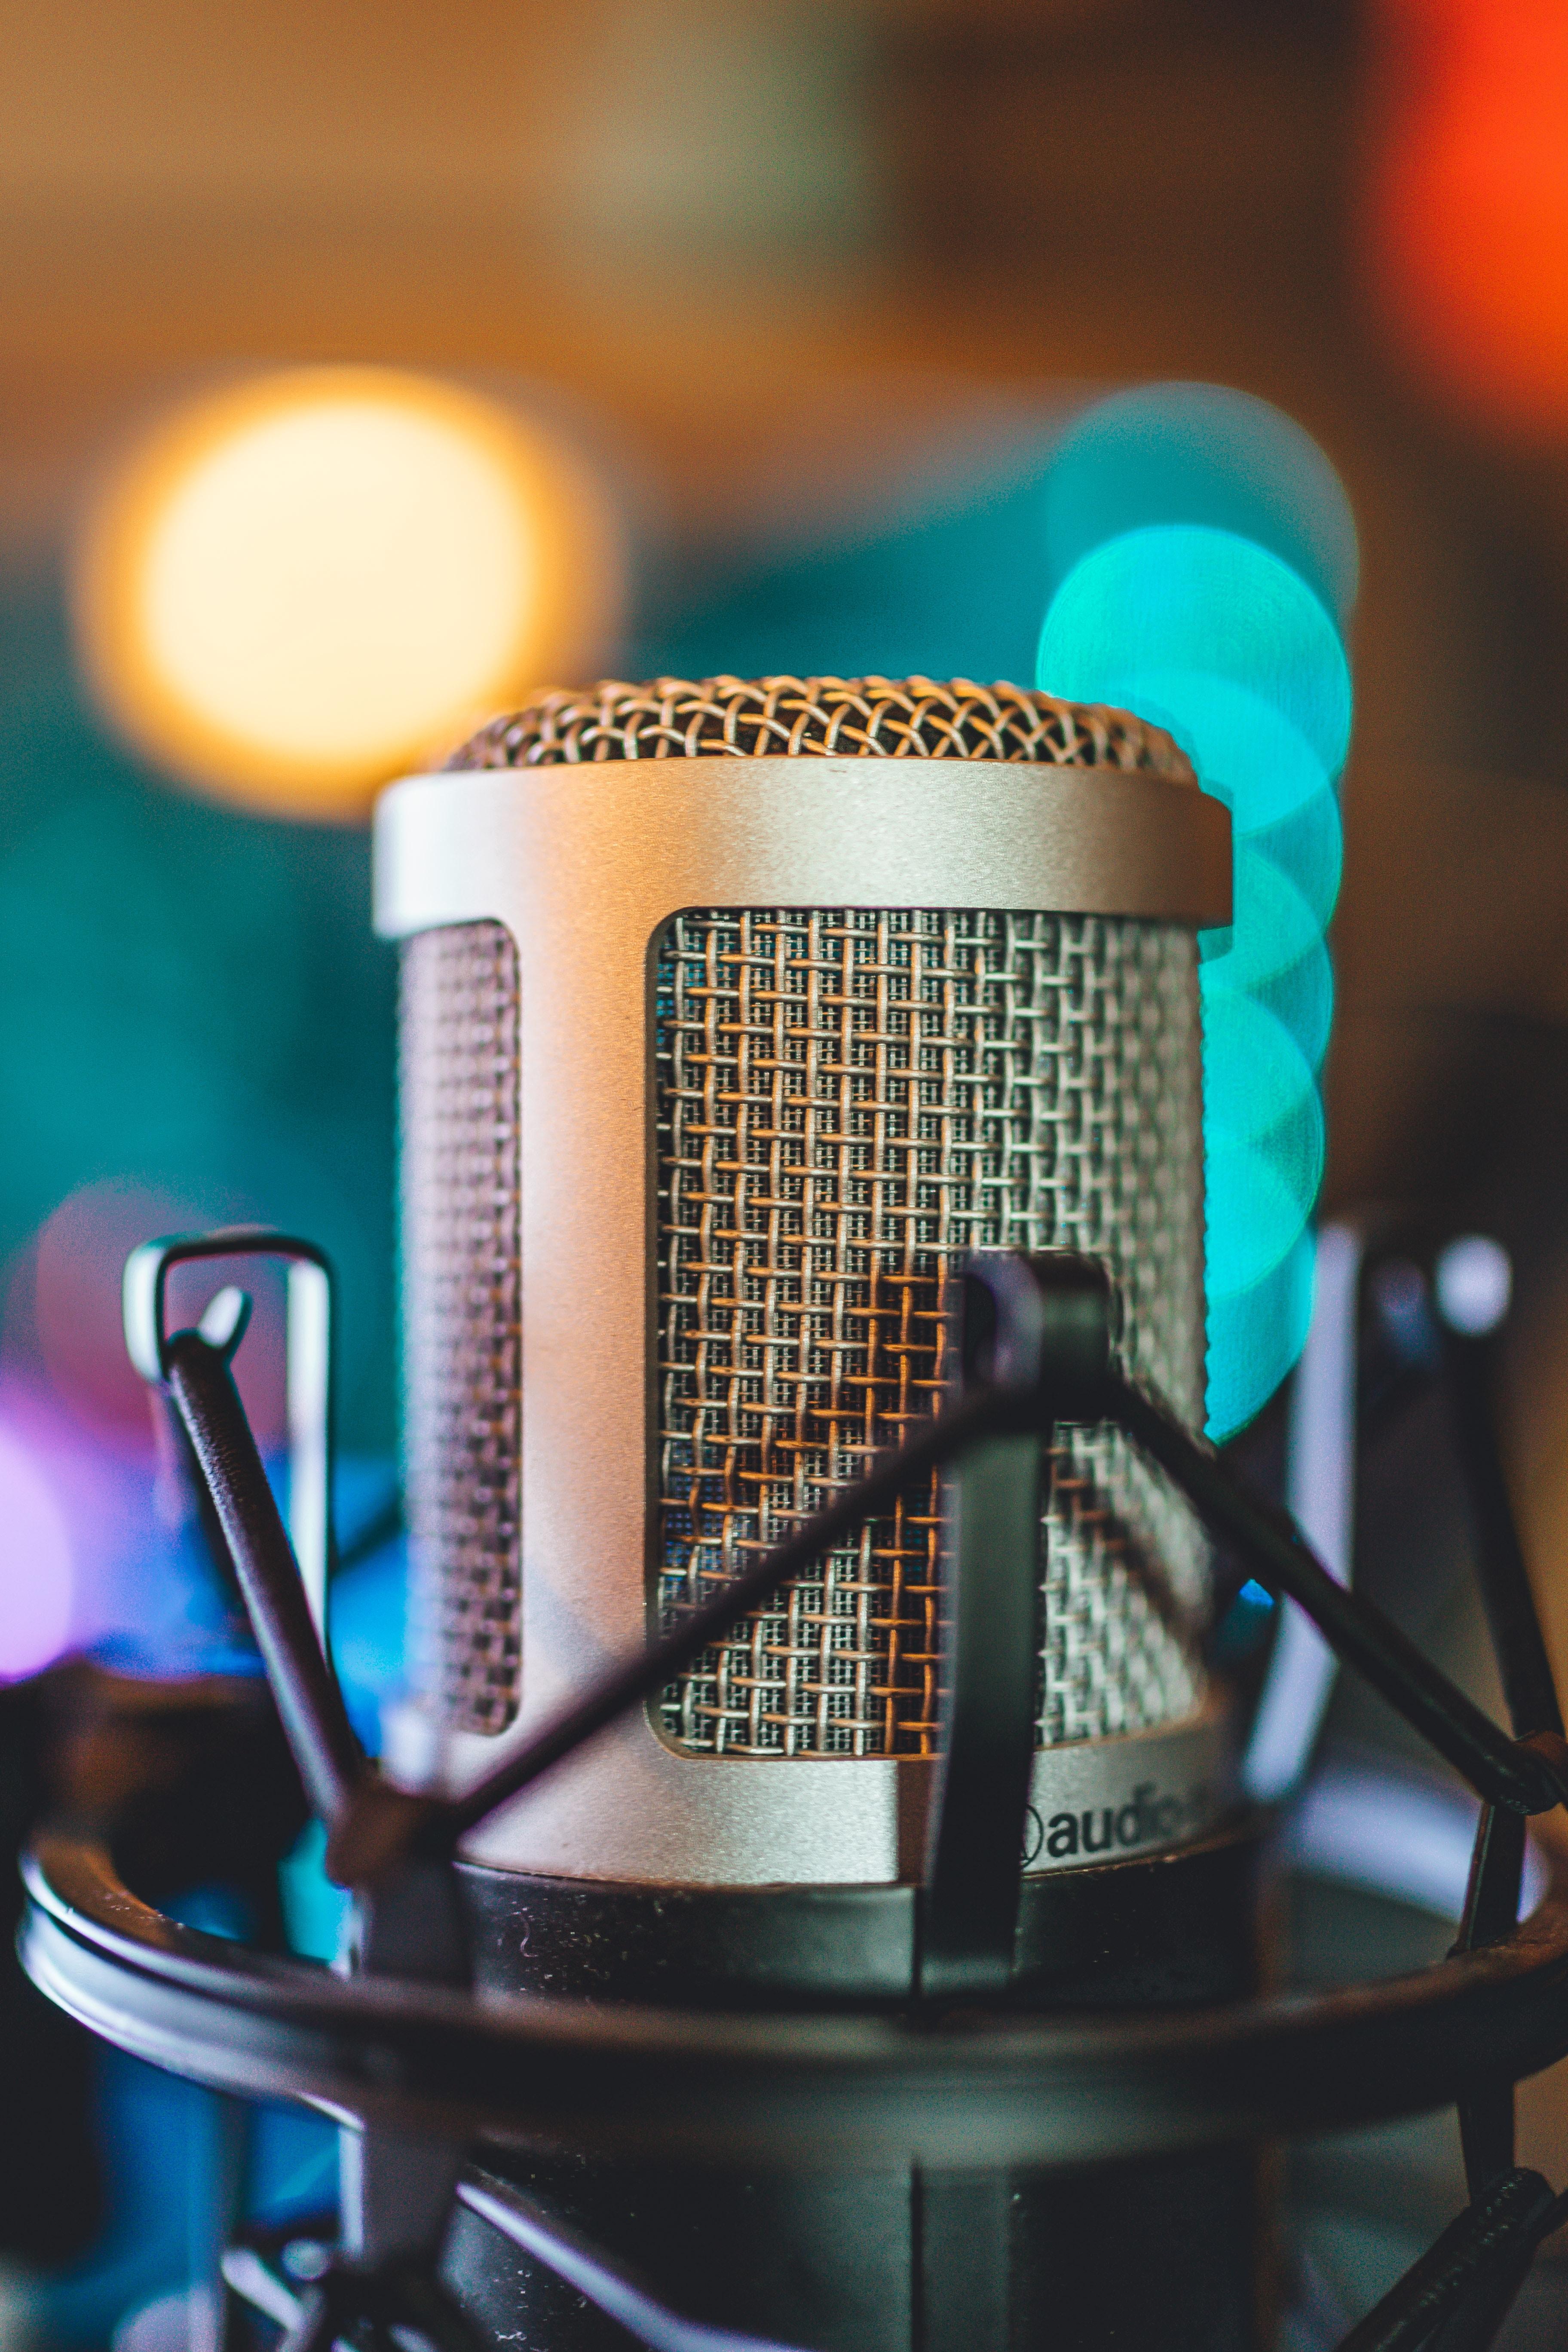 bokeh photo of gray Audio-Technica condenser microphone